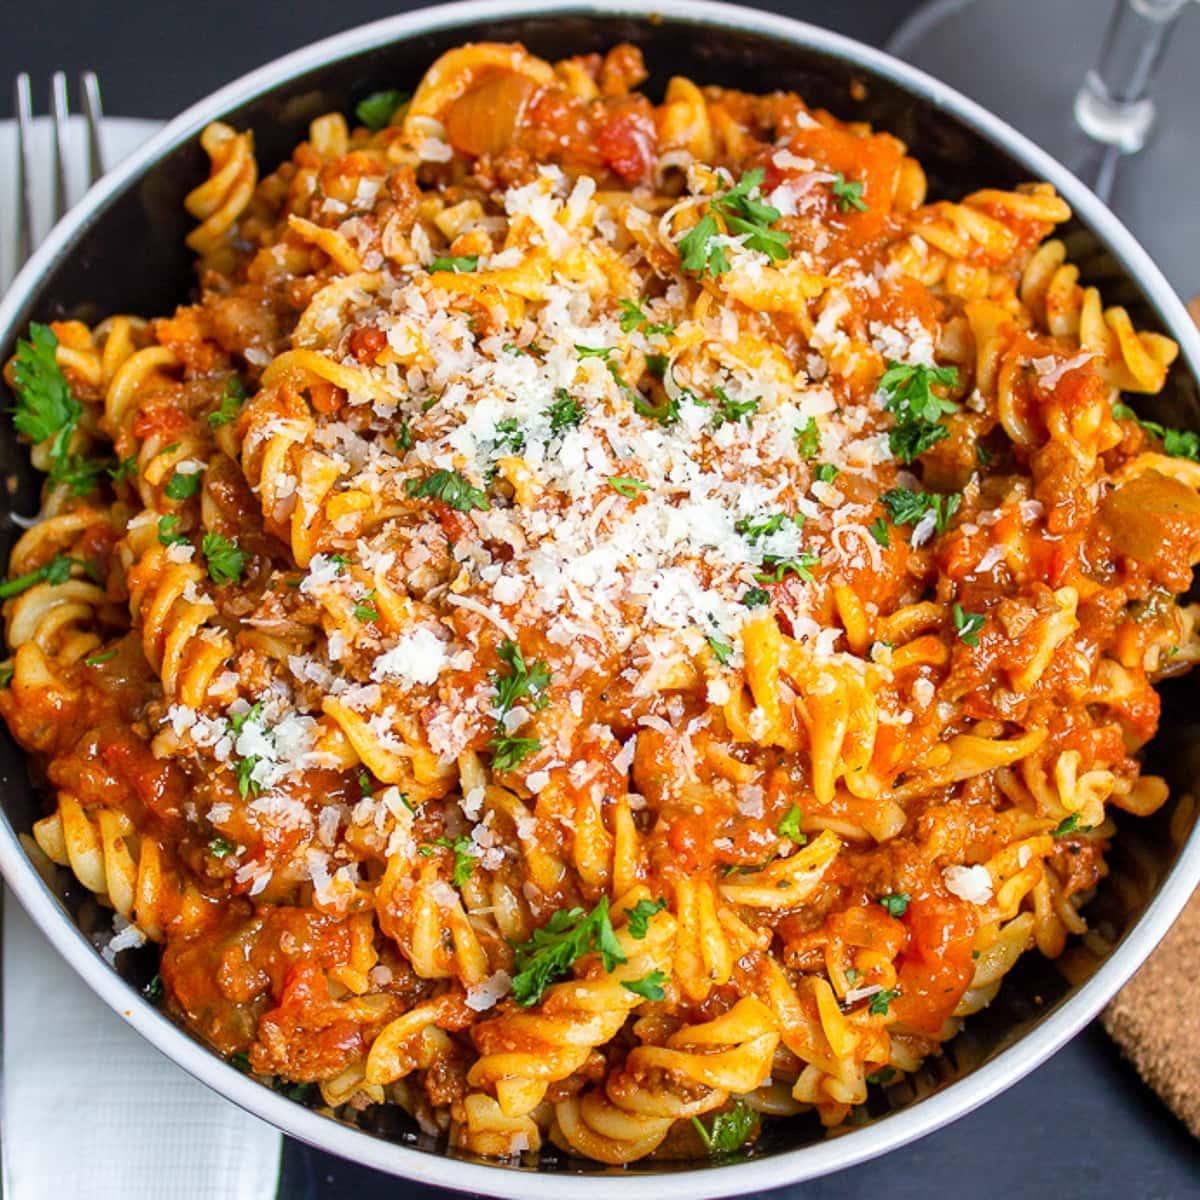 Vegetarian Bolognese (Instant Pot or Stovetop)